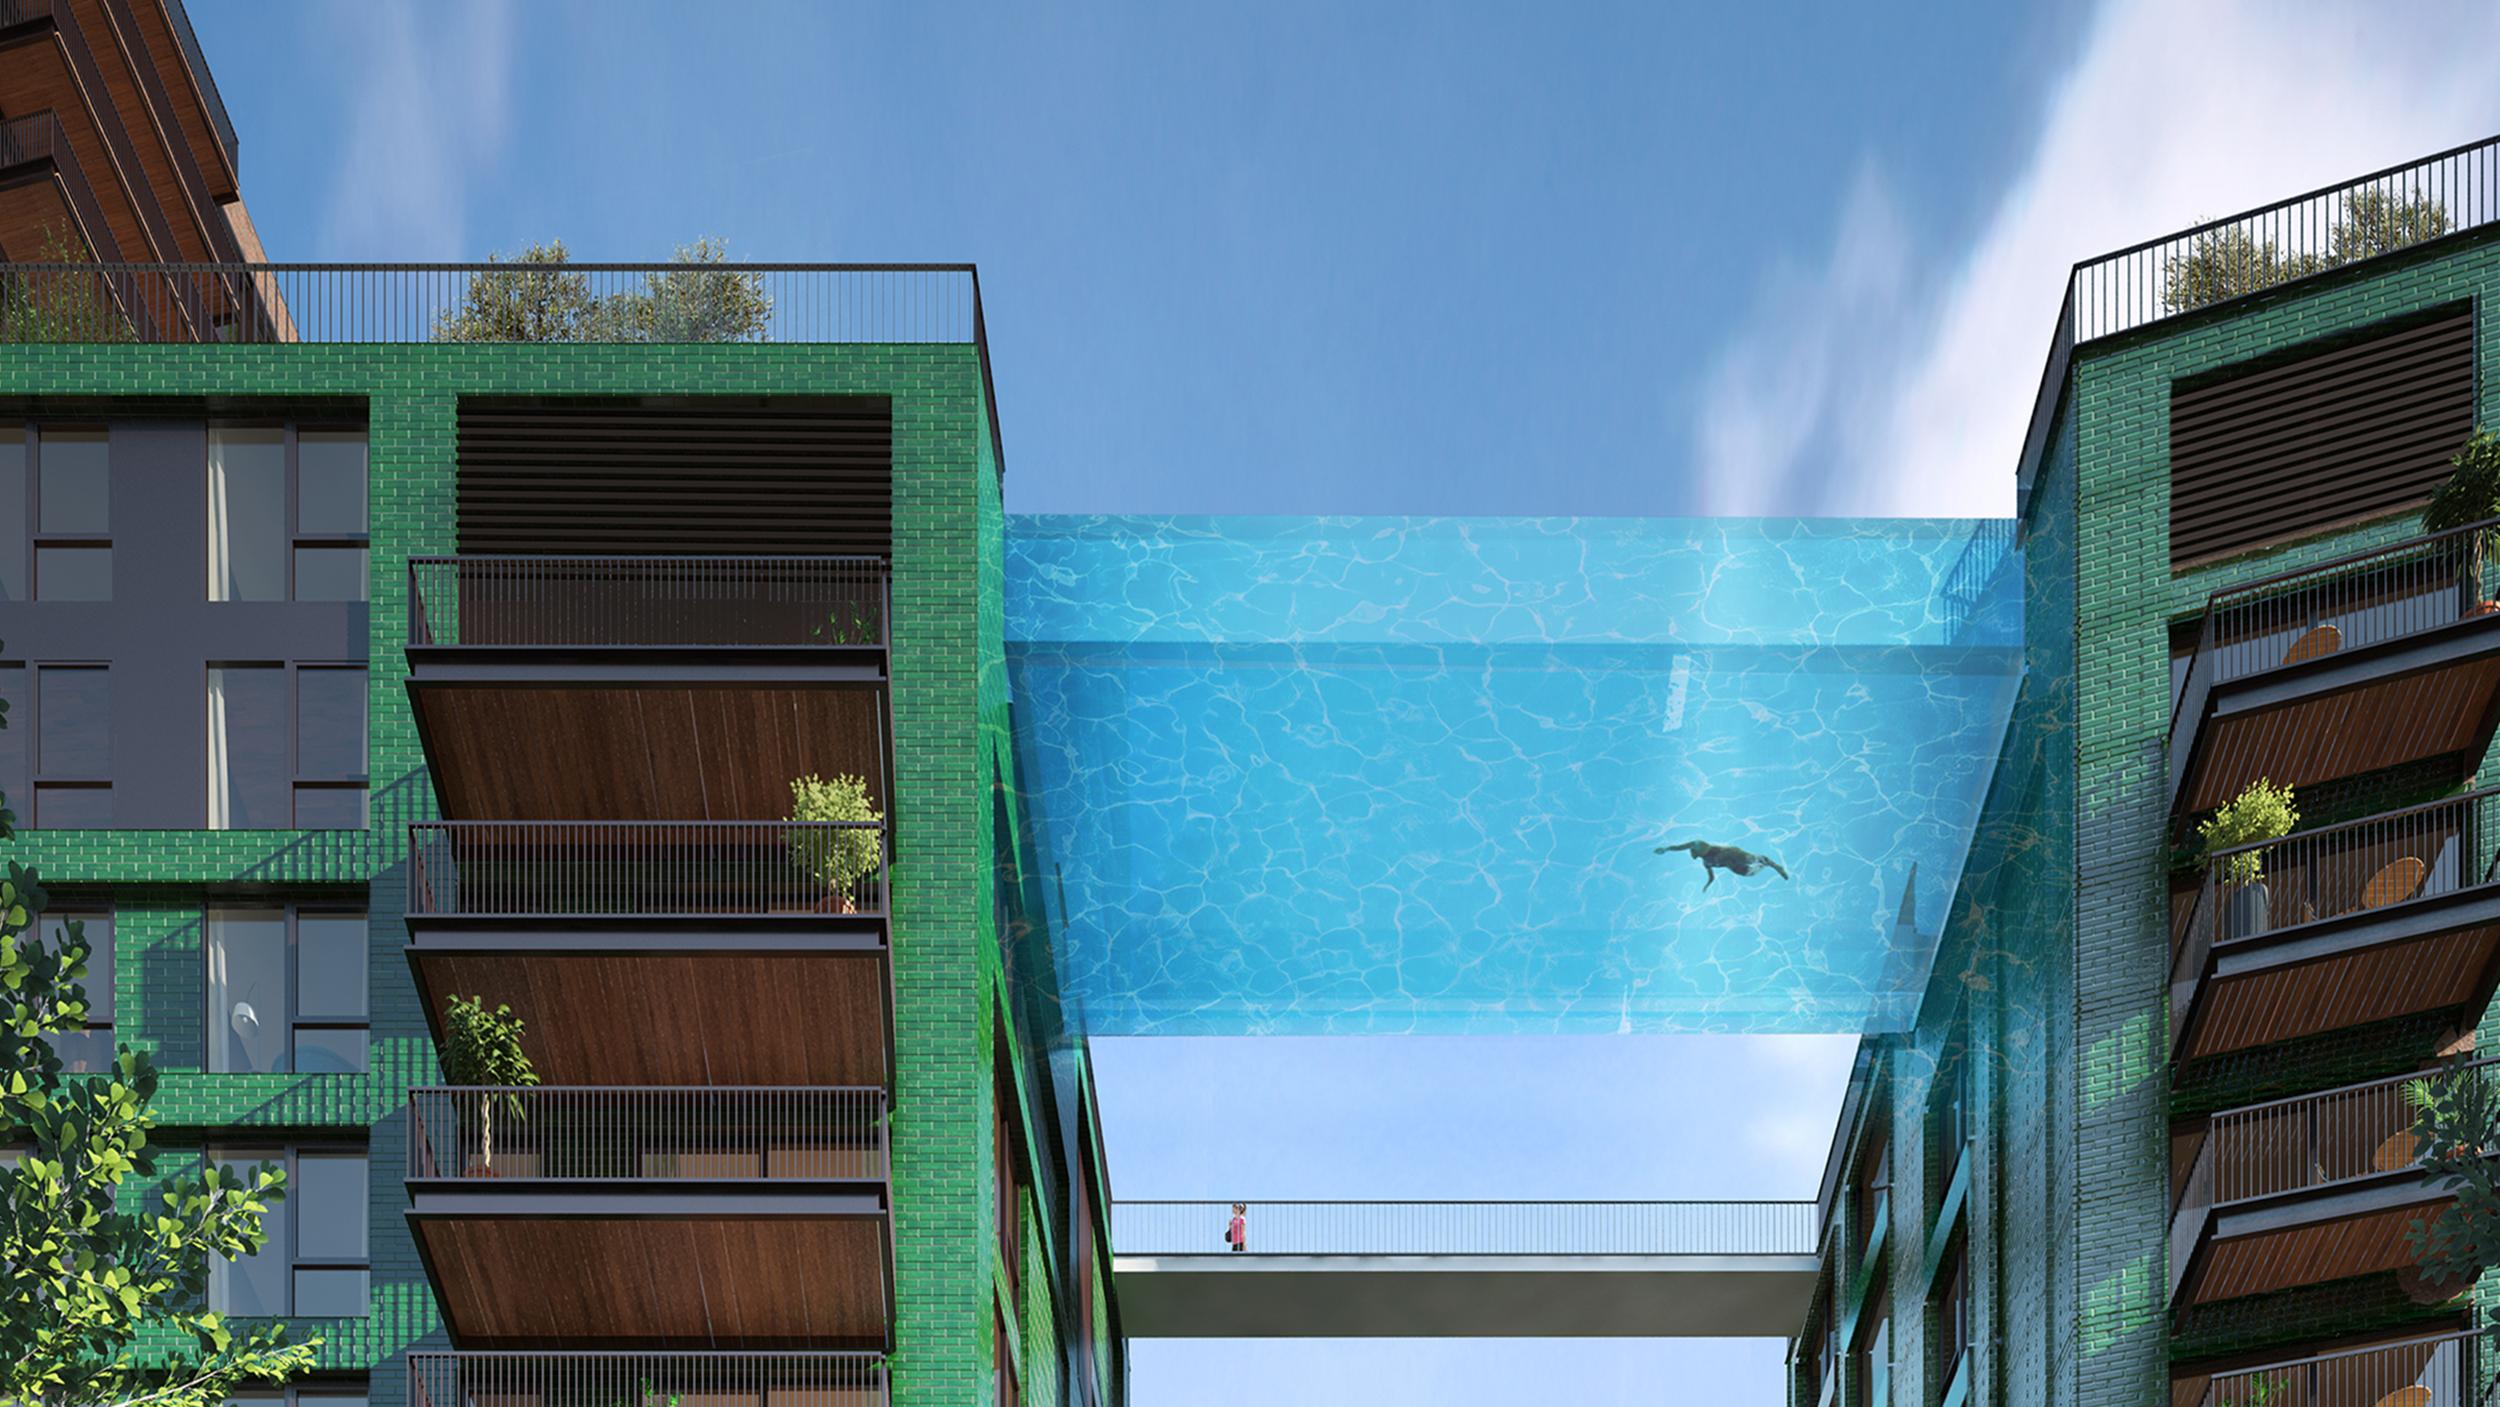 london 39 s transparent 39 sky pool 39 lets swimmers see 10. Black Bedroom Furniture Sets. Home Design Ideas